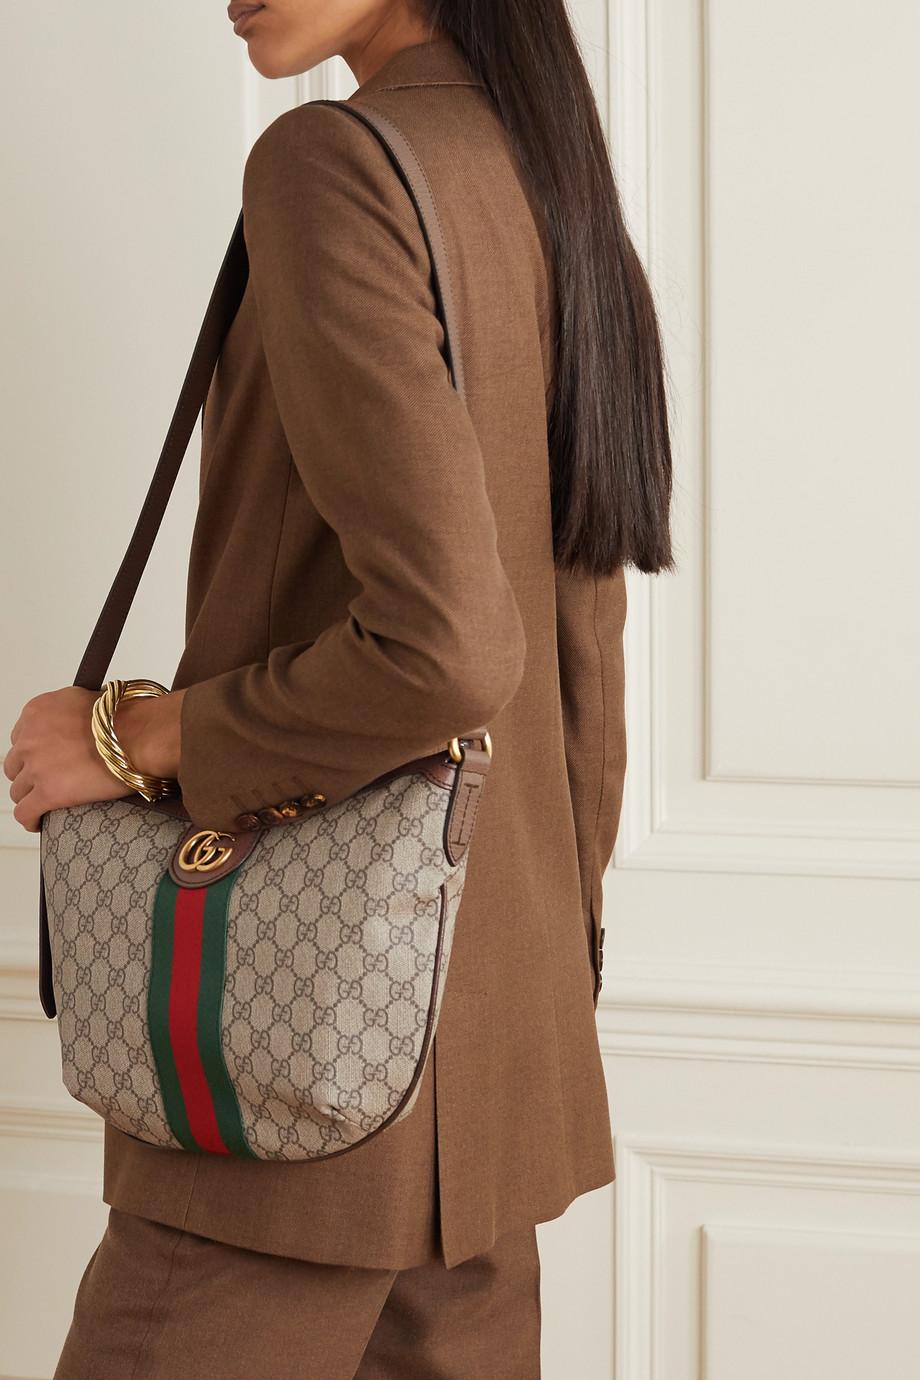 Gucci Ophidia 纹理皮革边饰印花涂层帆布单肩包